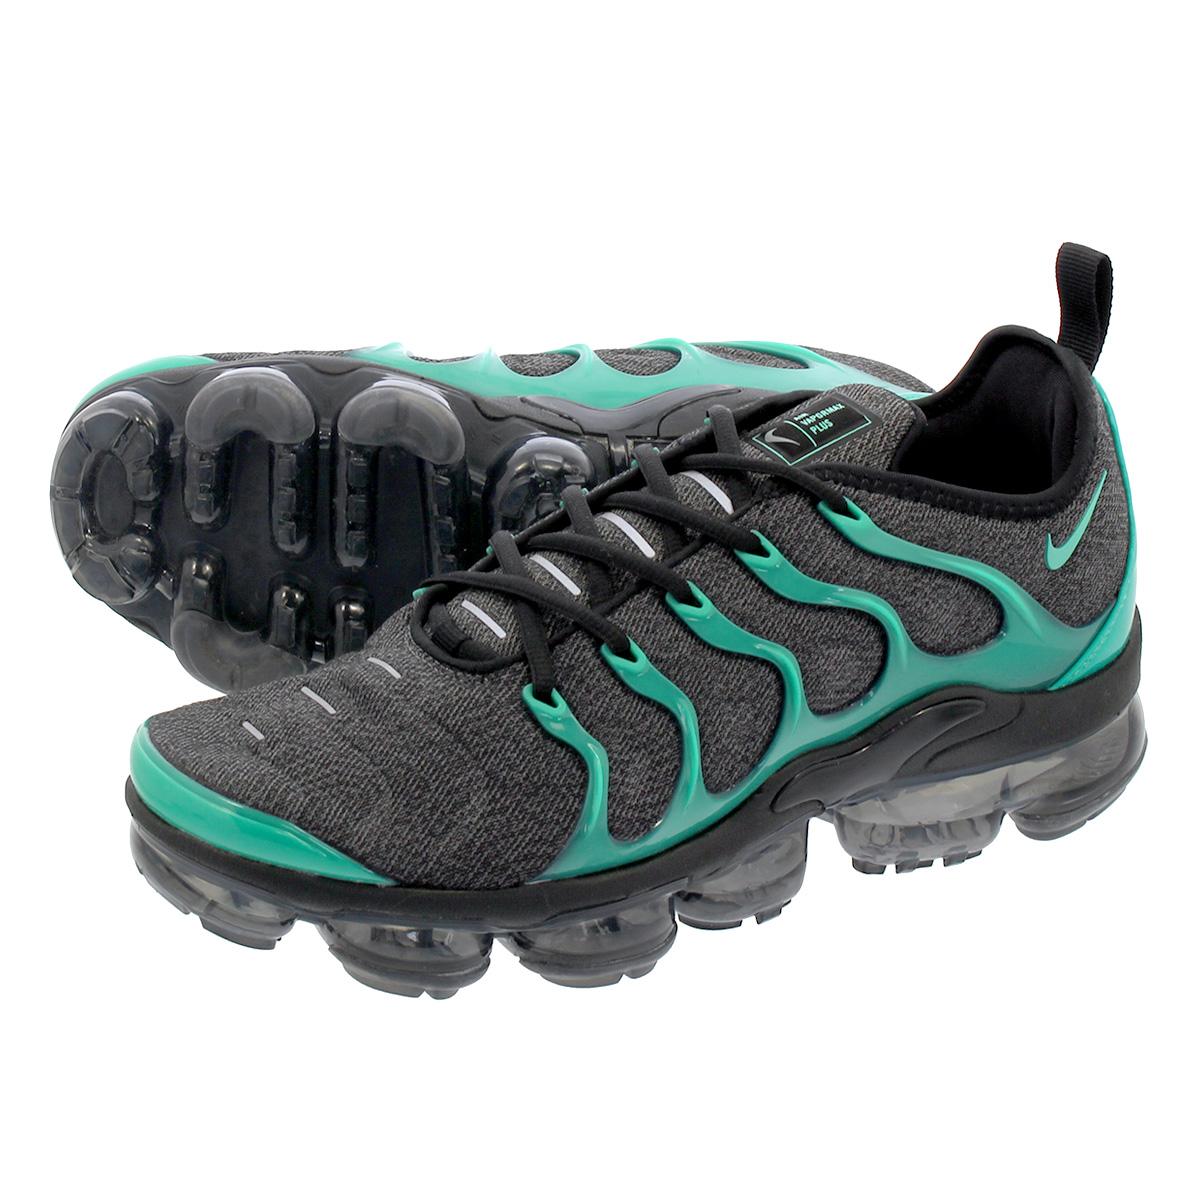 771e8bba3e9 LOWTEX PLUS  NIKE AIR VAPORMAX PLUS Nike vapor max plus BLACK GREEN ...